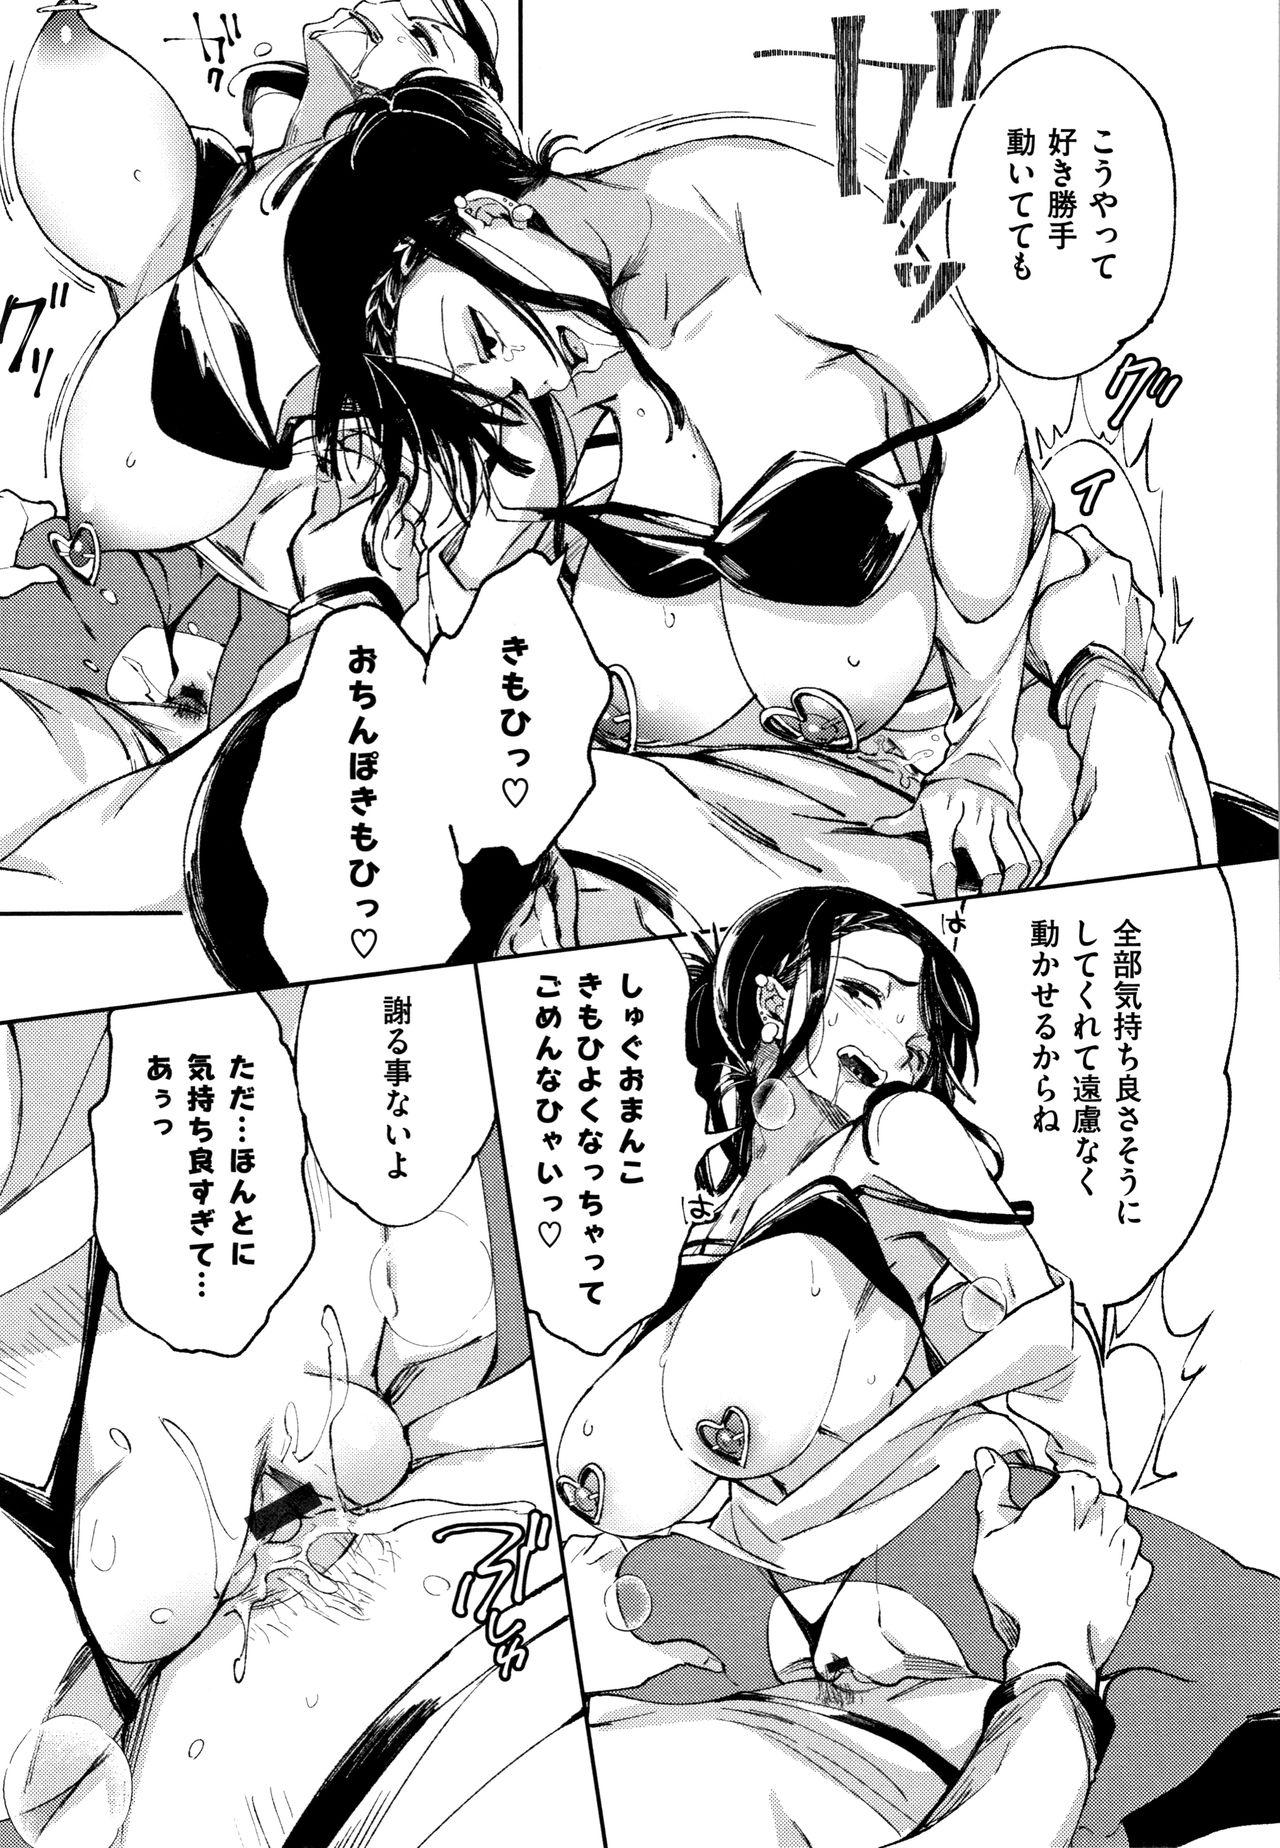 Saijaku Gal wa Ikizurai! - The weakest pussy is hard to go. 191